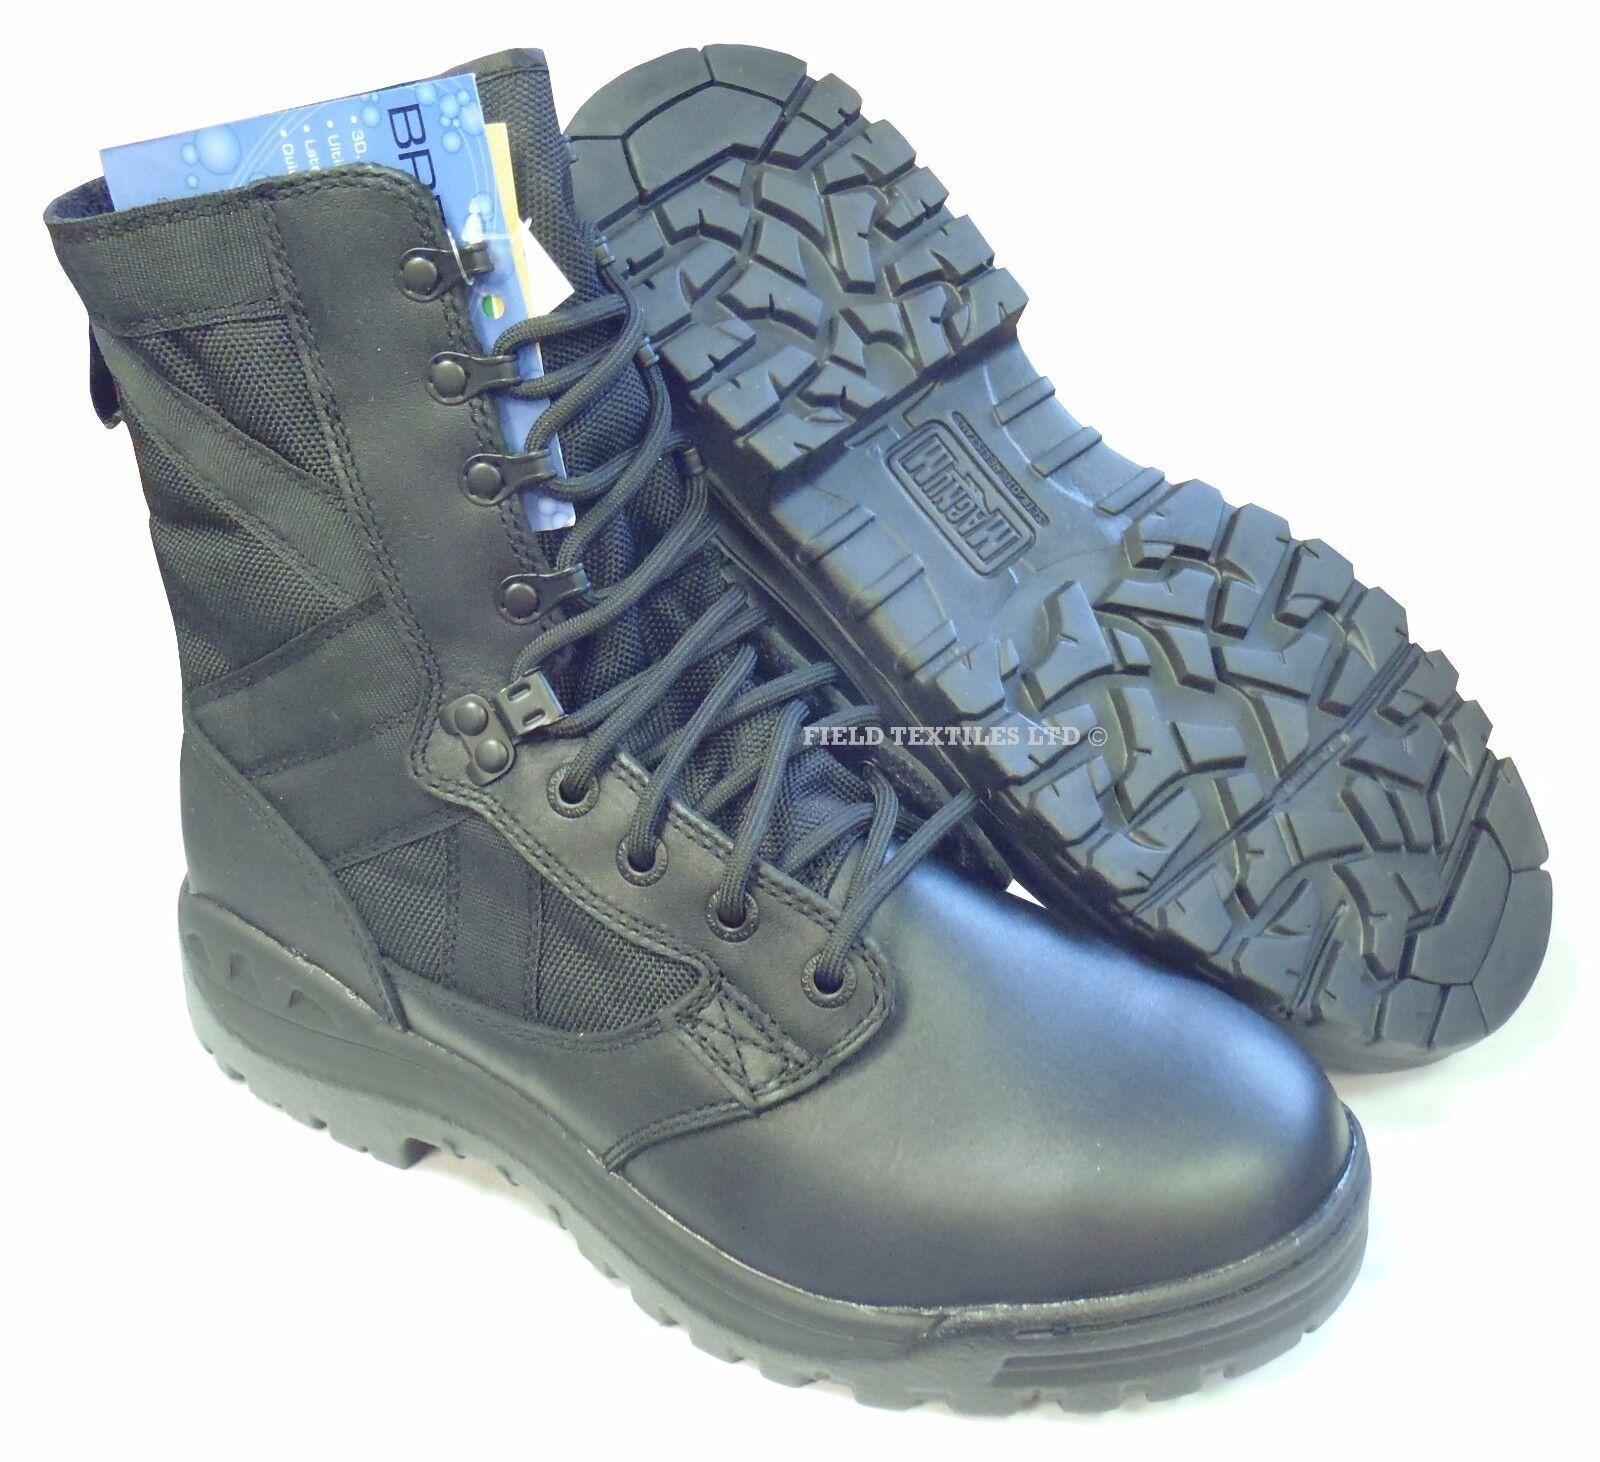 BRITISH ARMY - MAGNUM Negro 14 PATROL botas - Talla 14 Negro MEDIUM - NEW IN BOX f711da